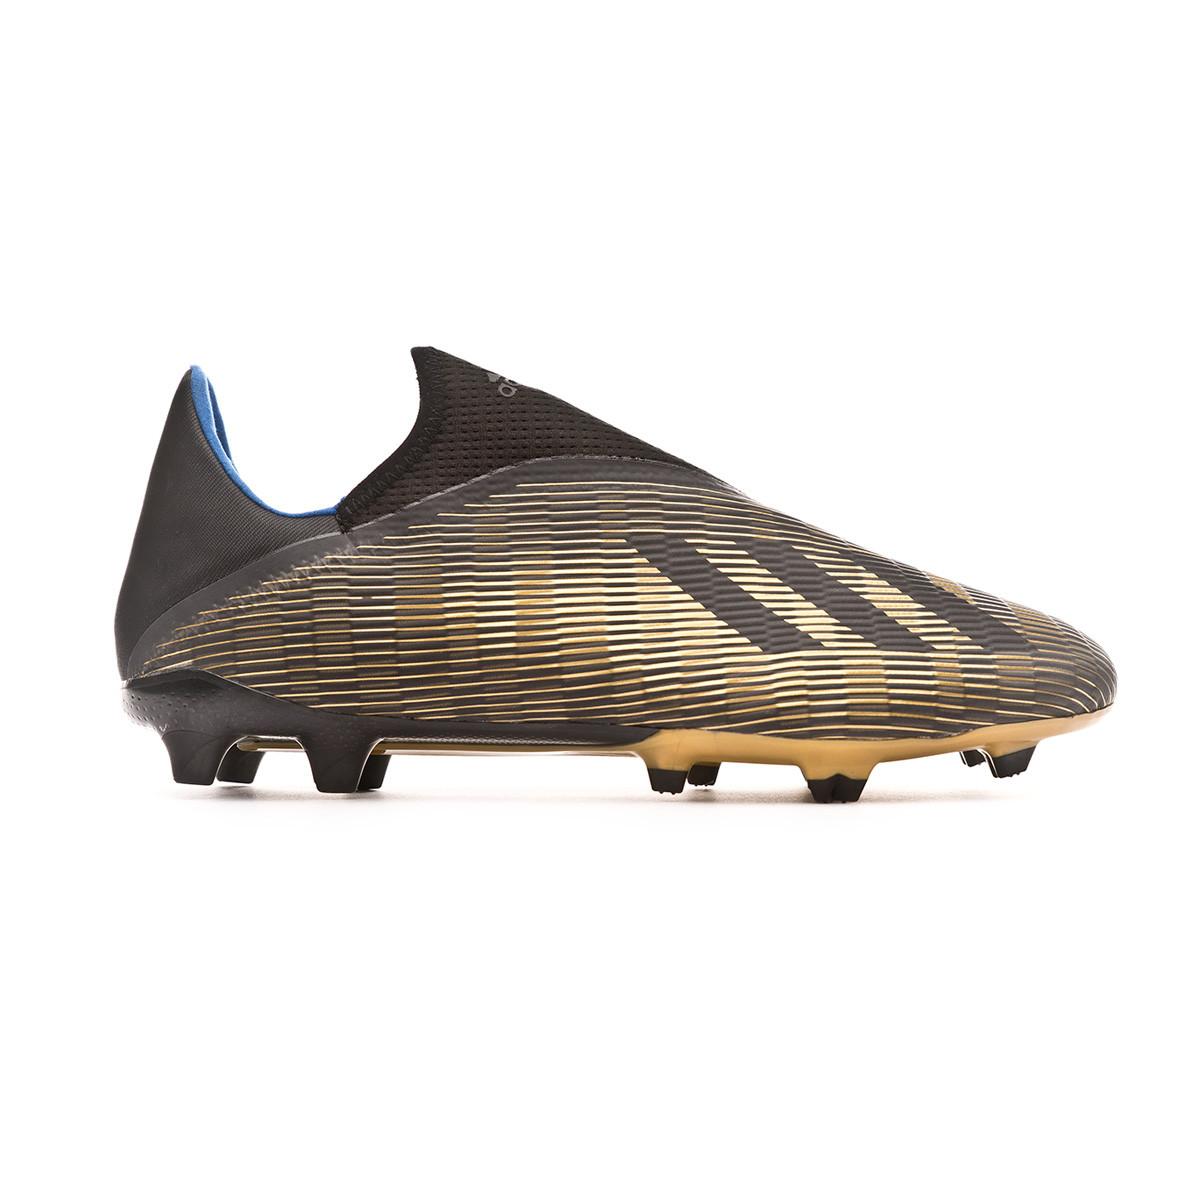 adidas X 19.3 LL FG Football Boots